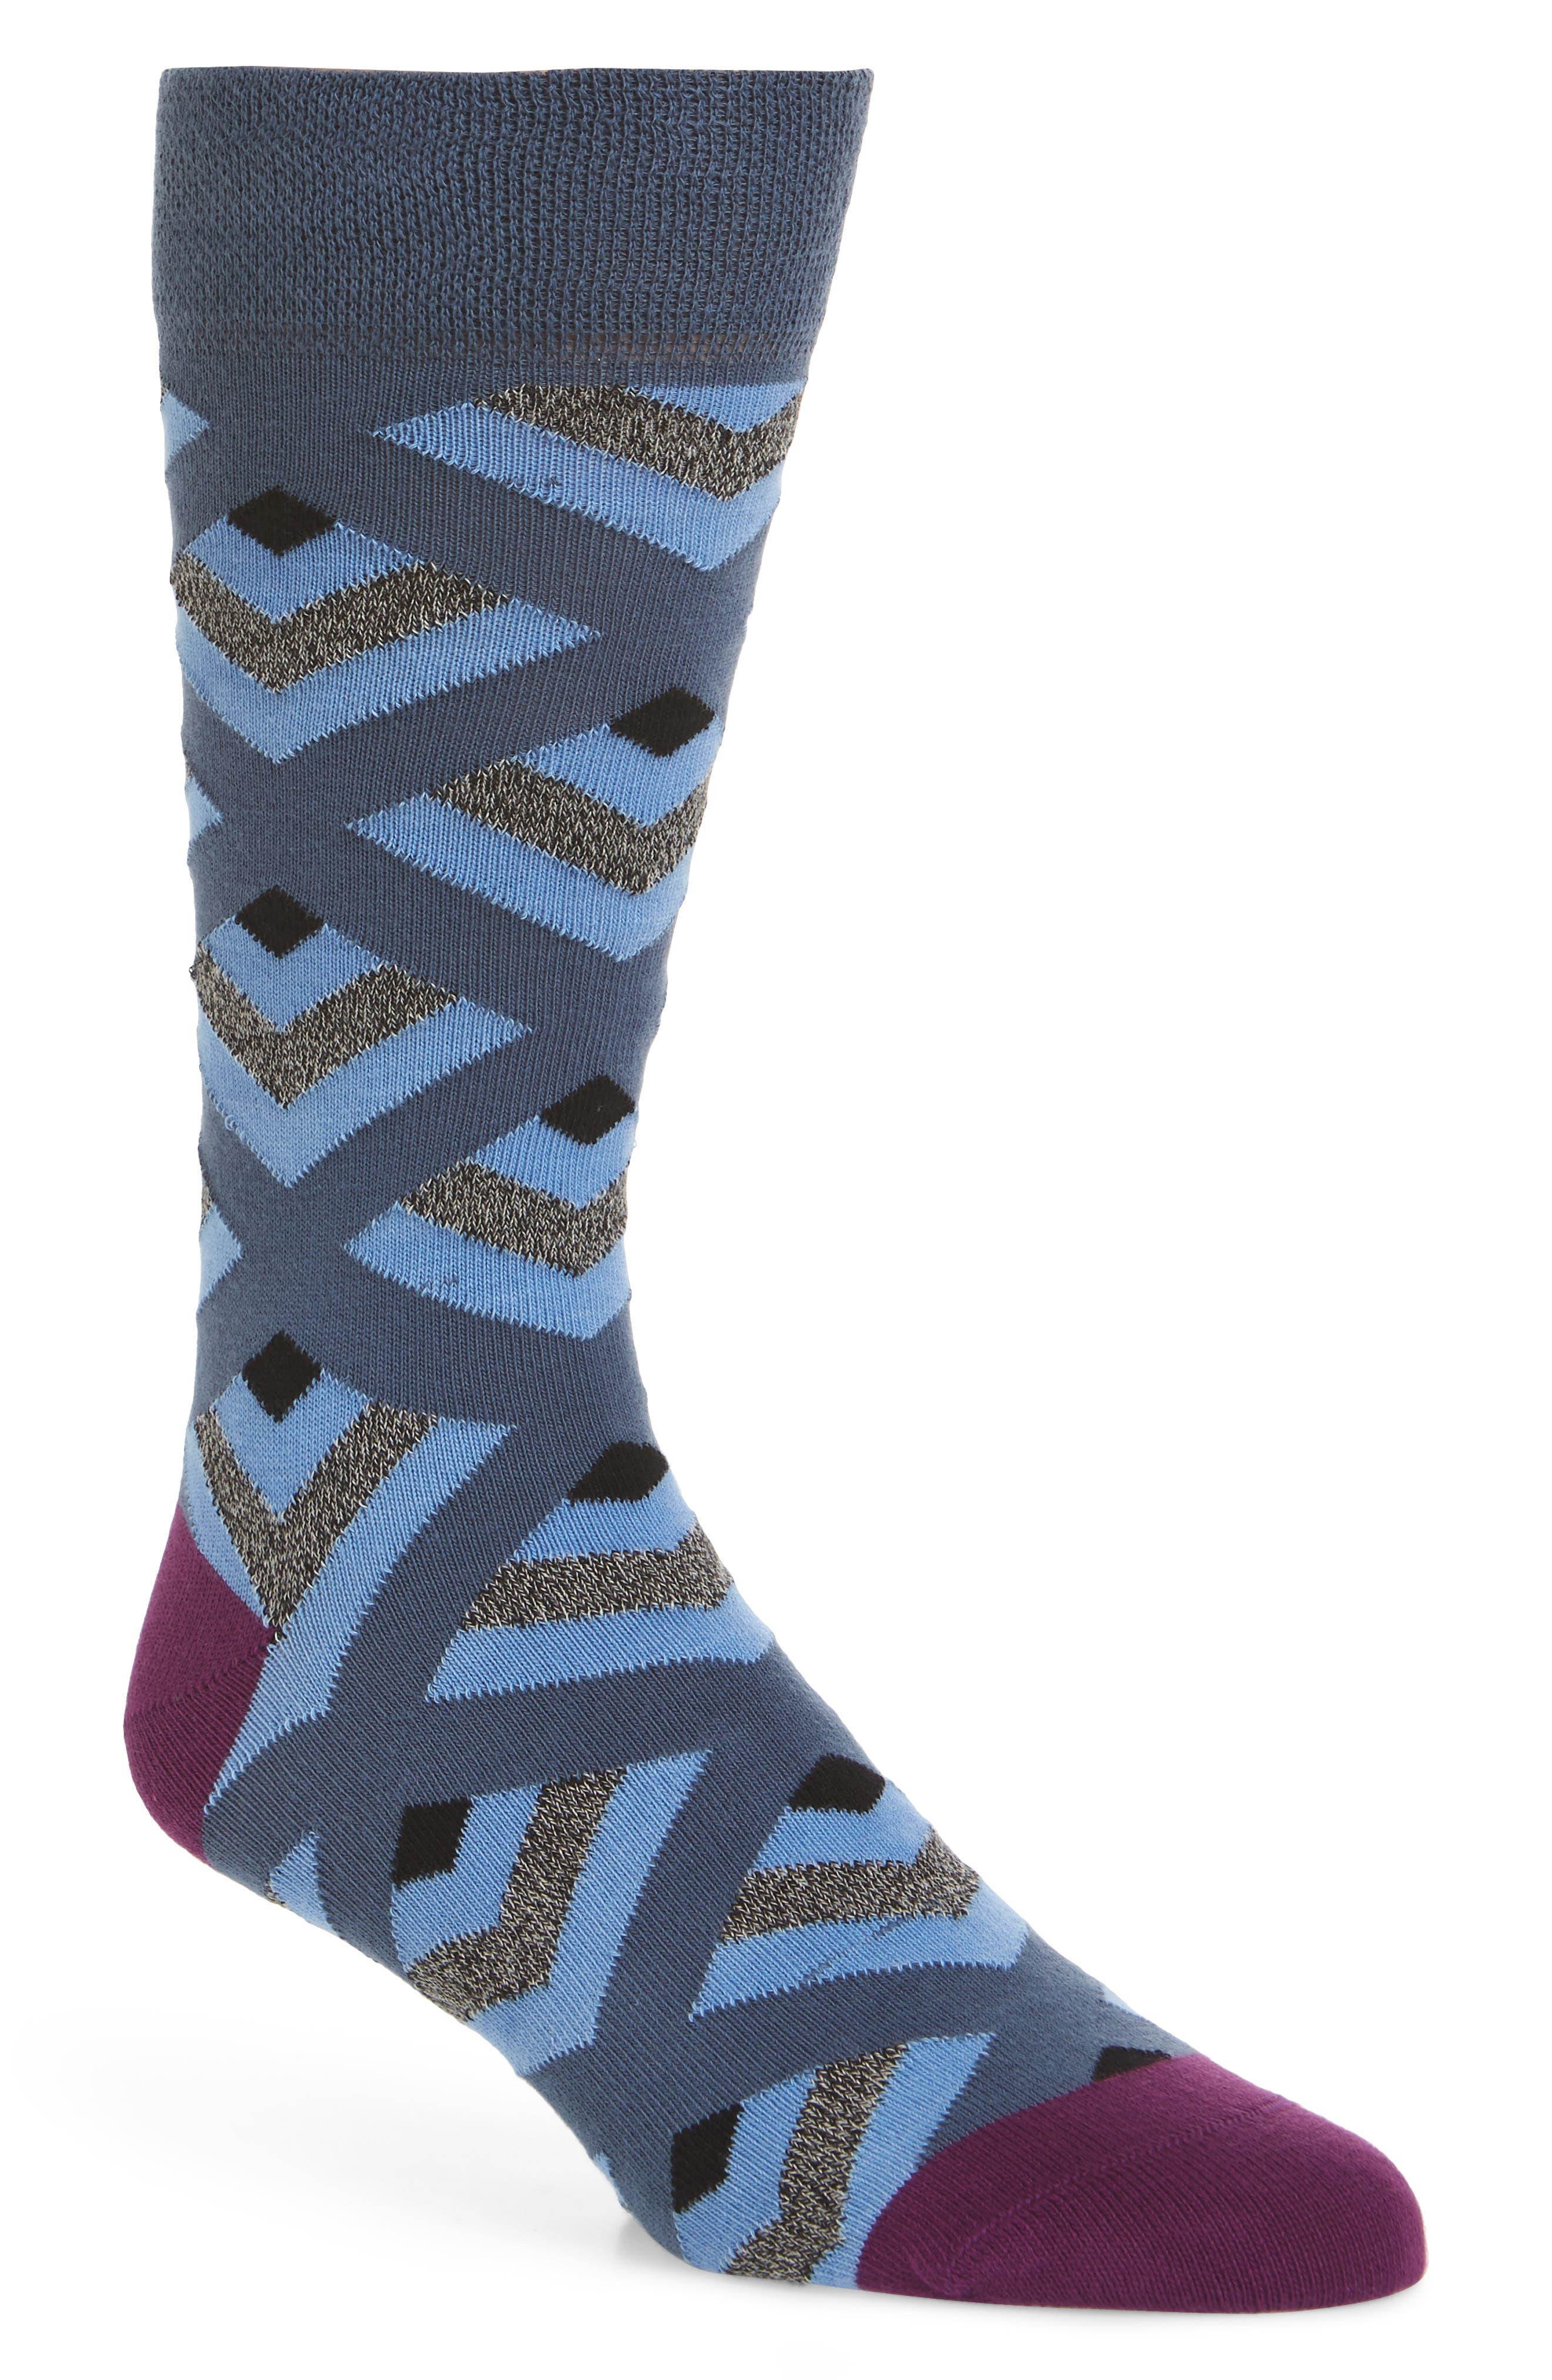 Ram Geometric Socks,                             Main thumbnail 1, color,                             421